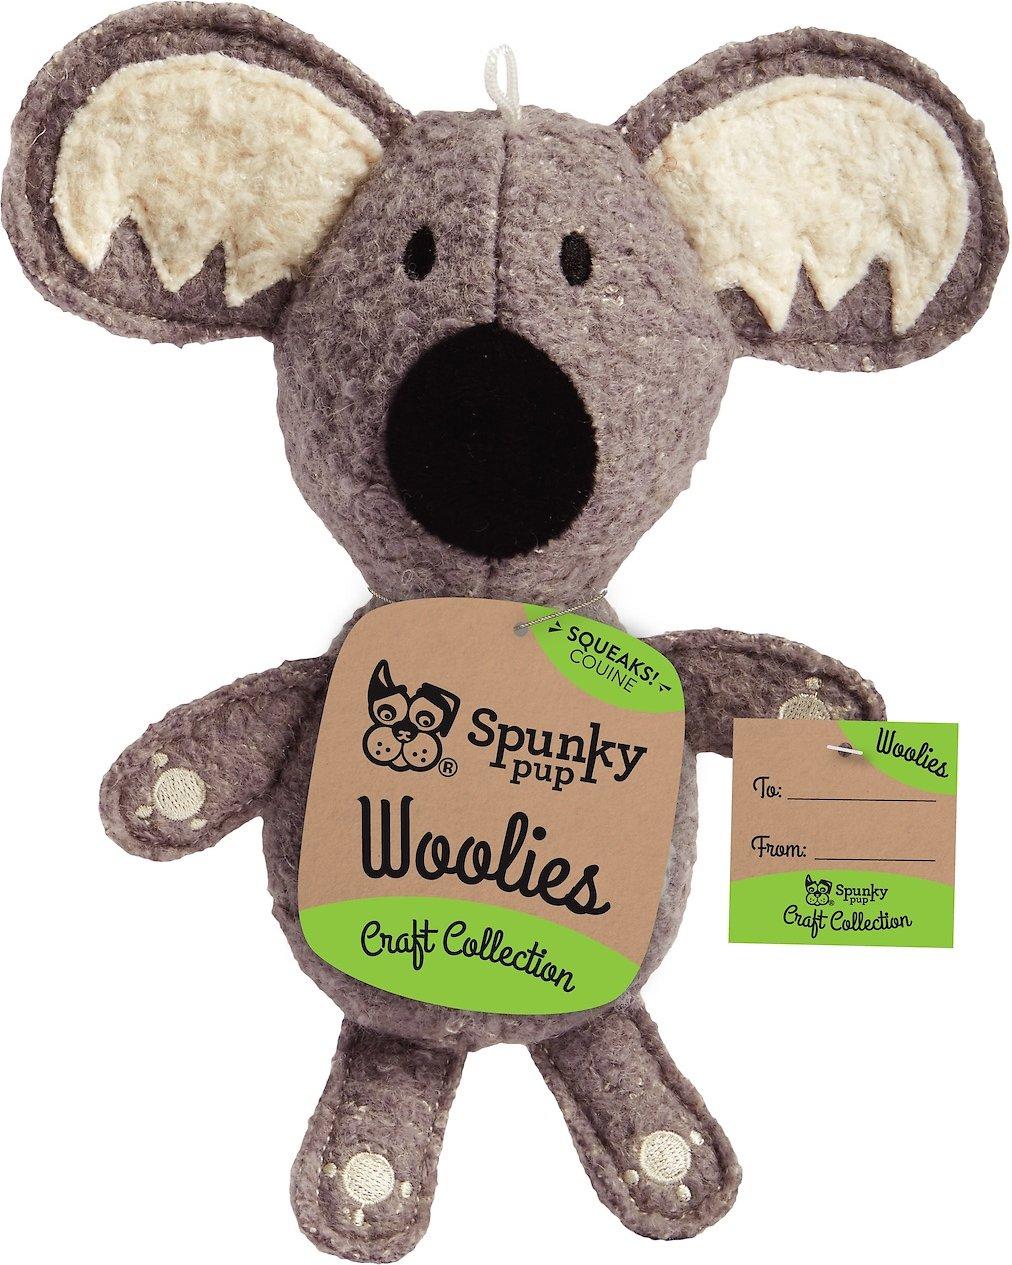 Spunky Pup Woolies, Koala, Mini